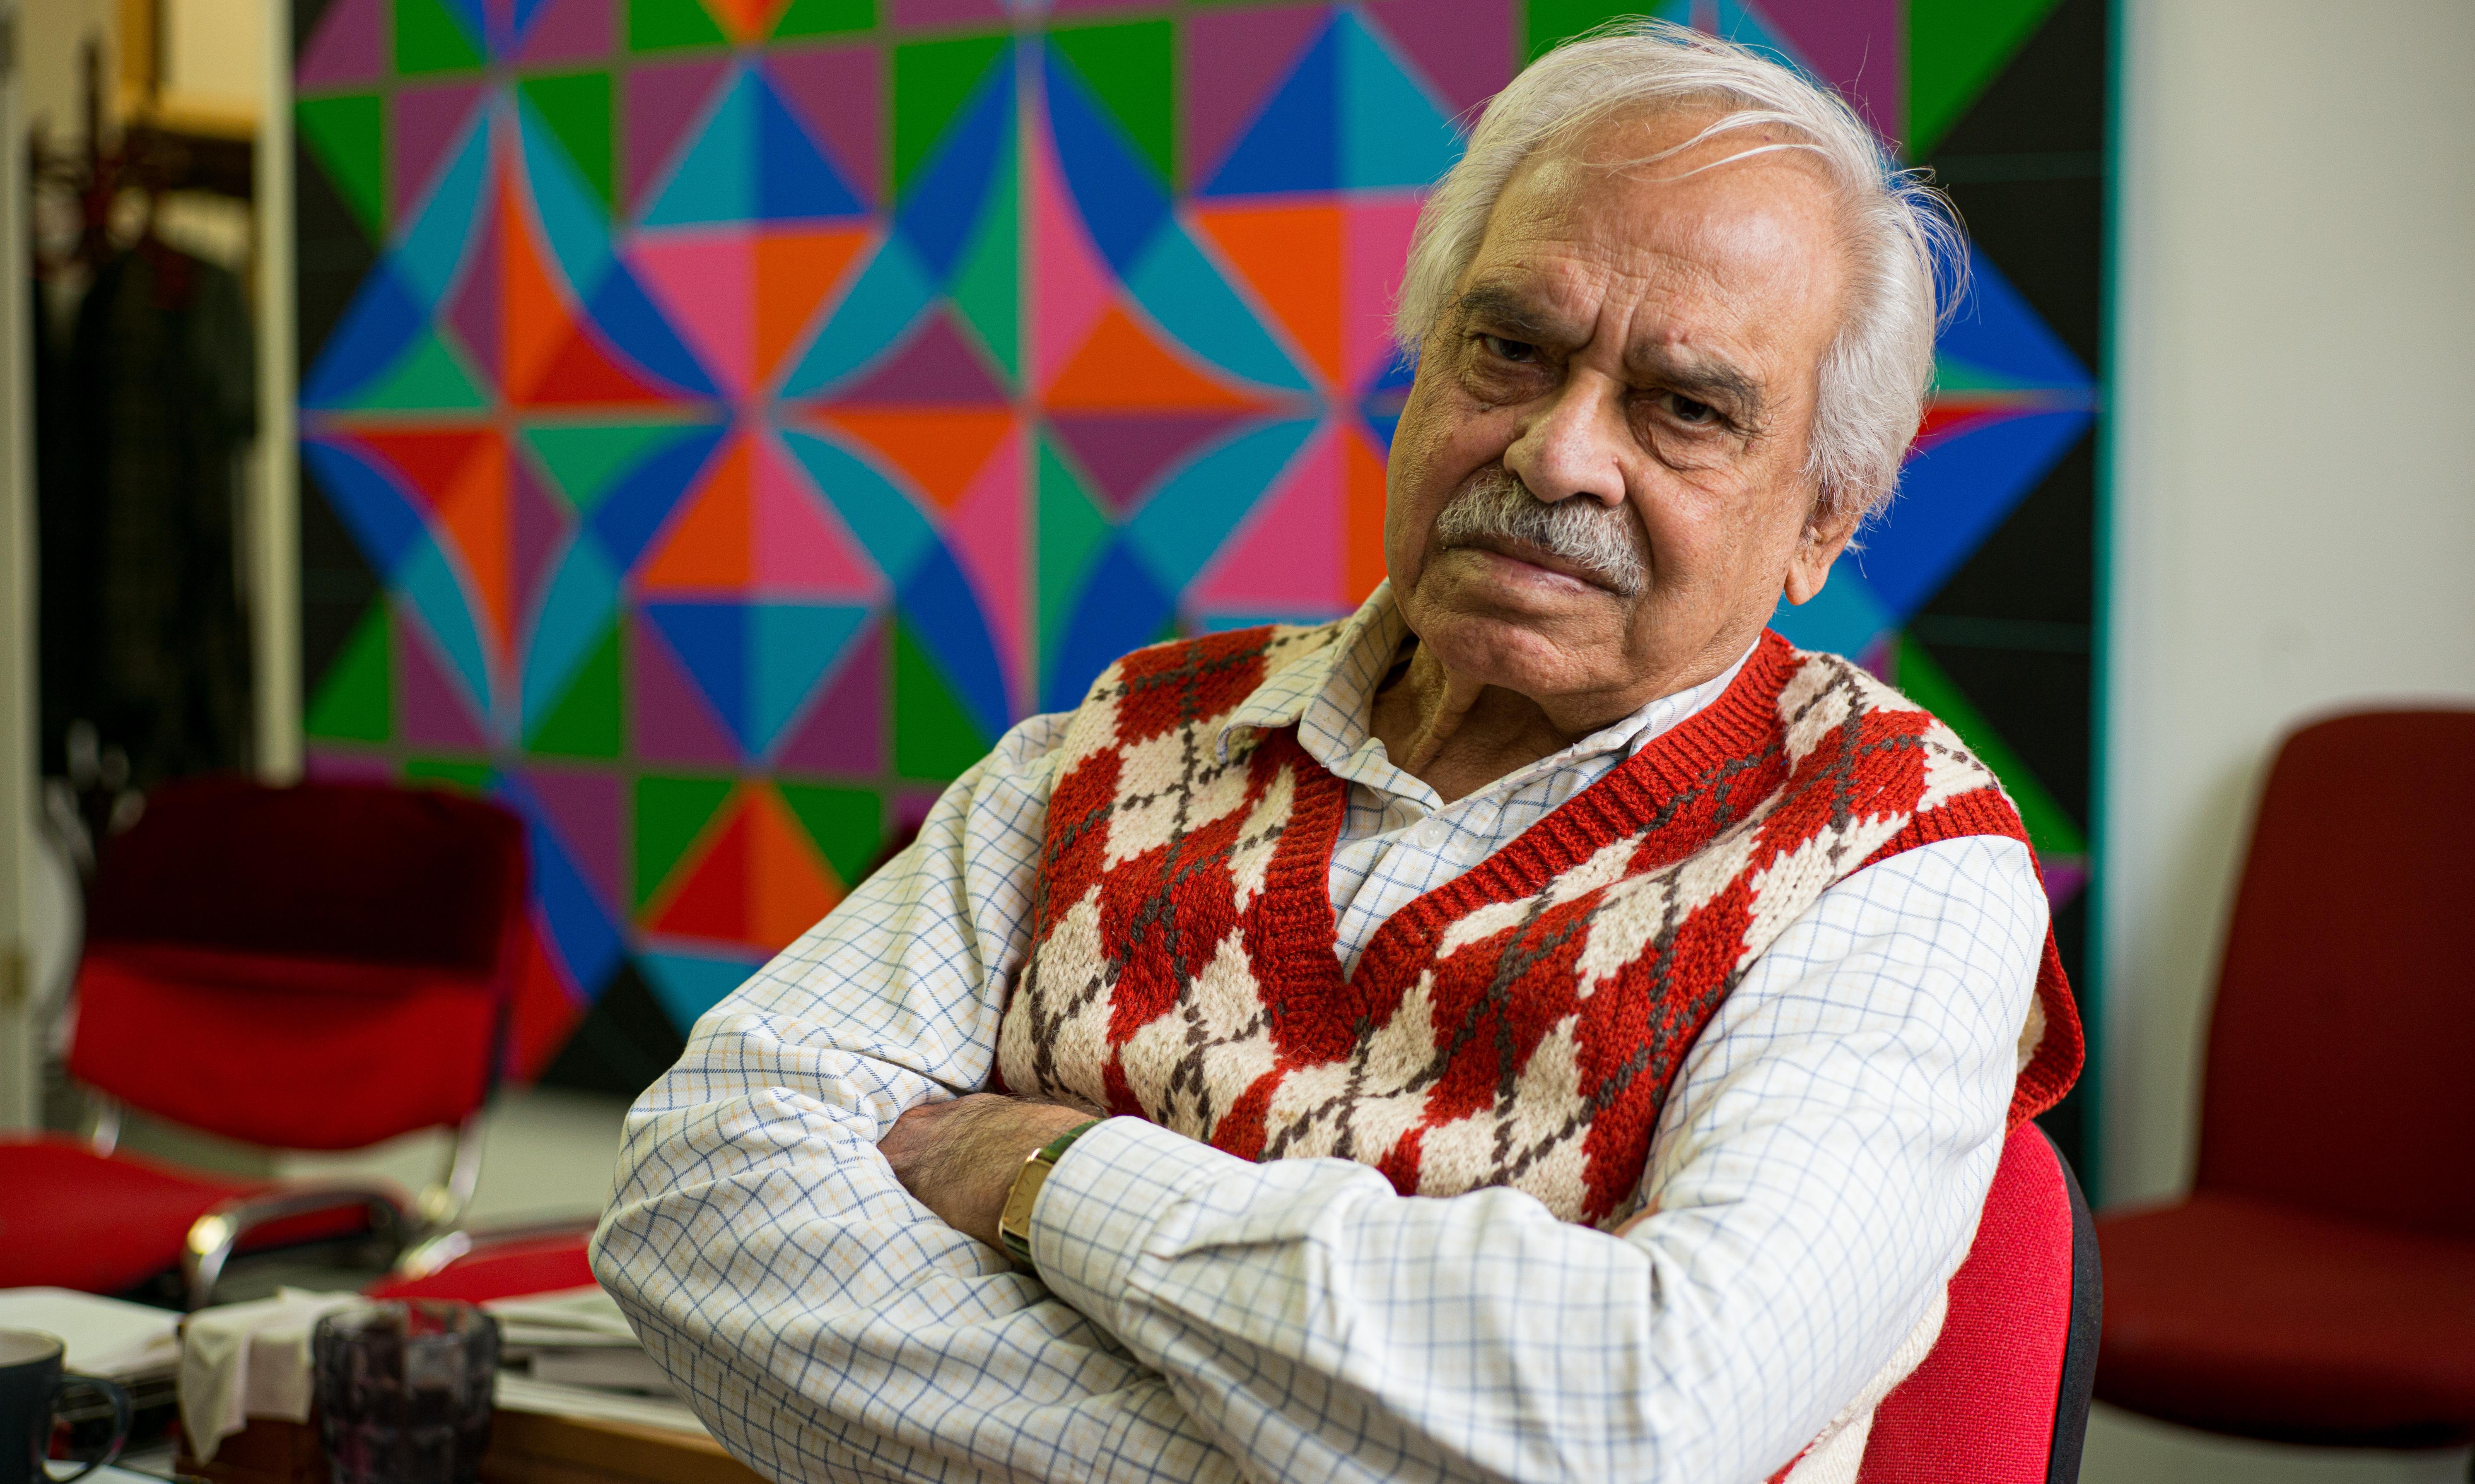 'My life has been a struggle against the establishment': artist Rasheed Araeen